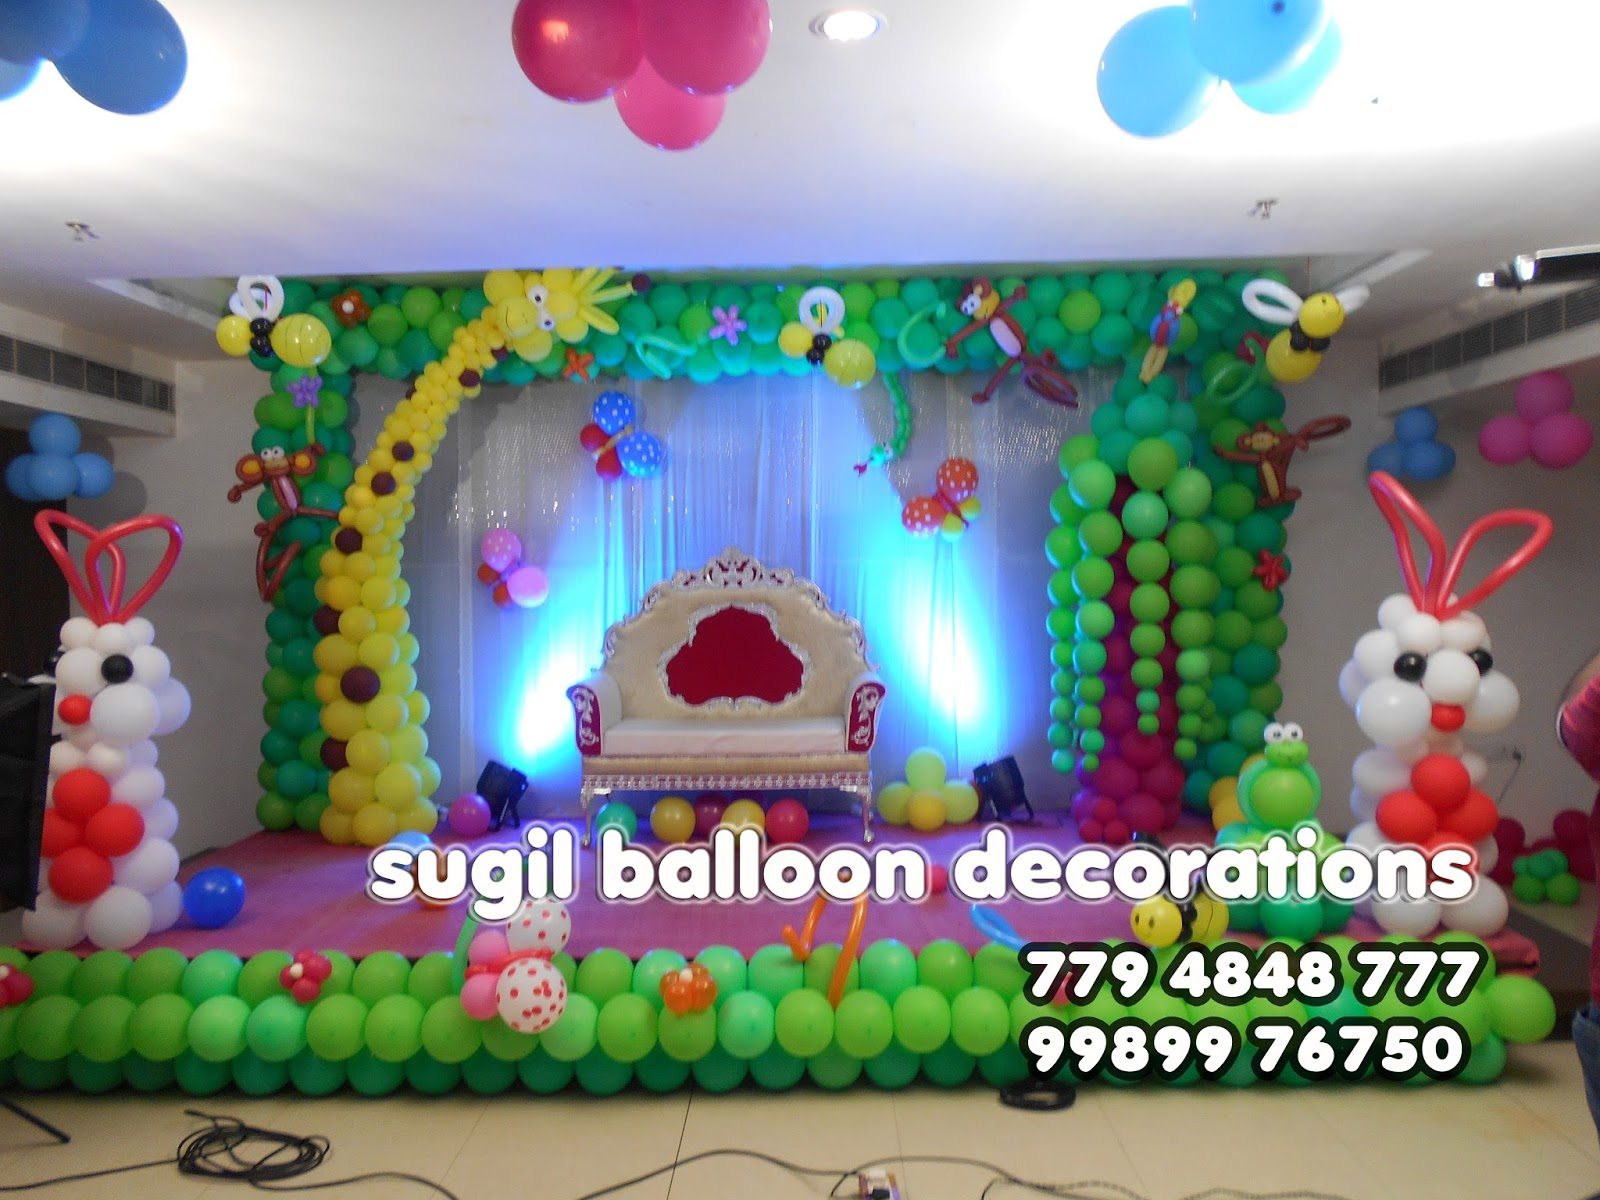 Sugil Balloon Decorations In Eluru